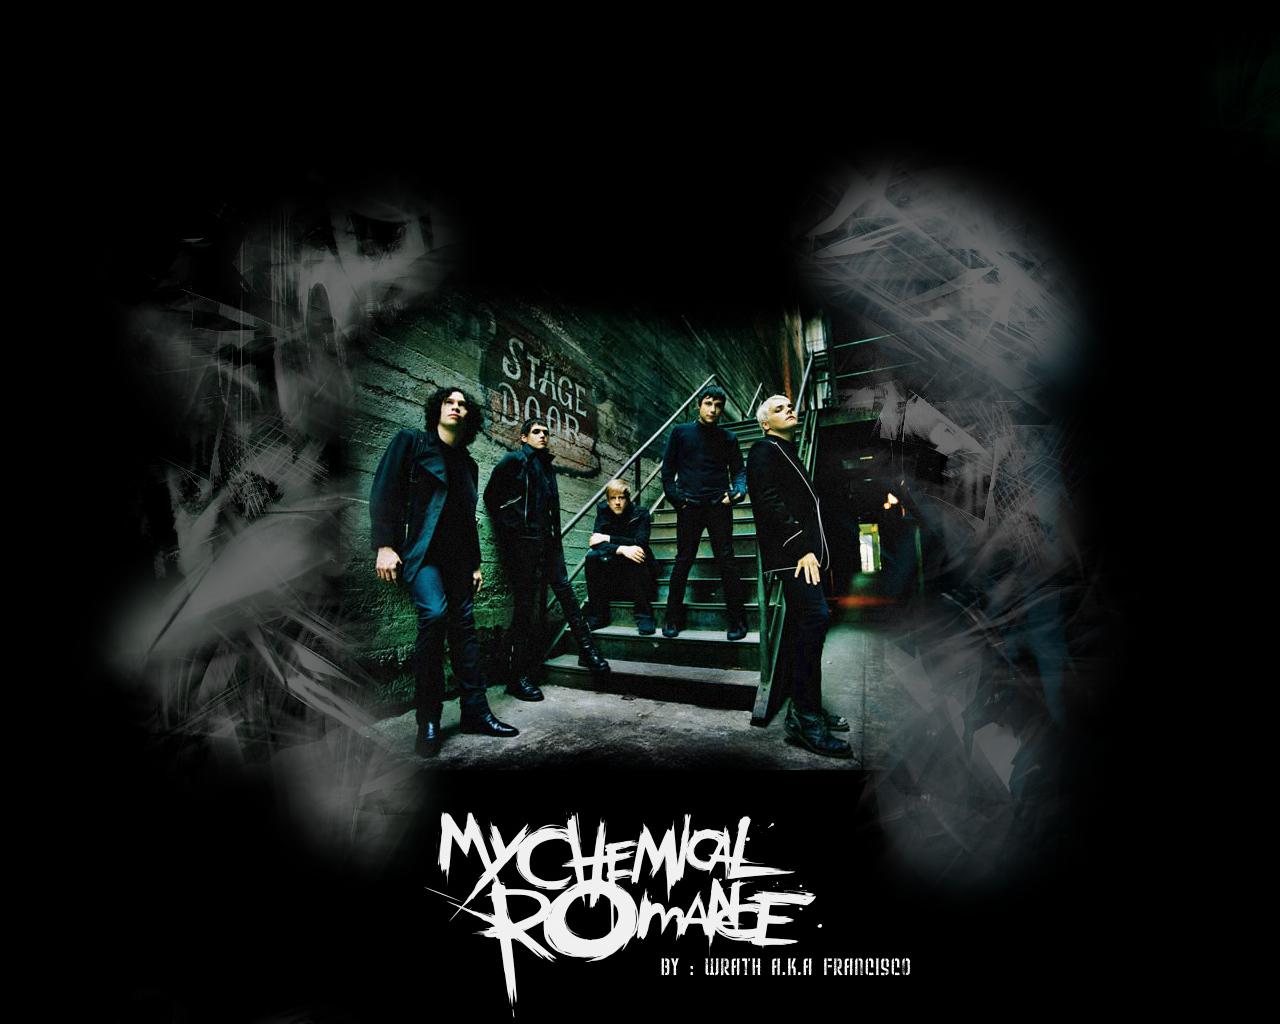 My Chemical Romance Wallpaper by King Aeolus 1280x1024